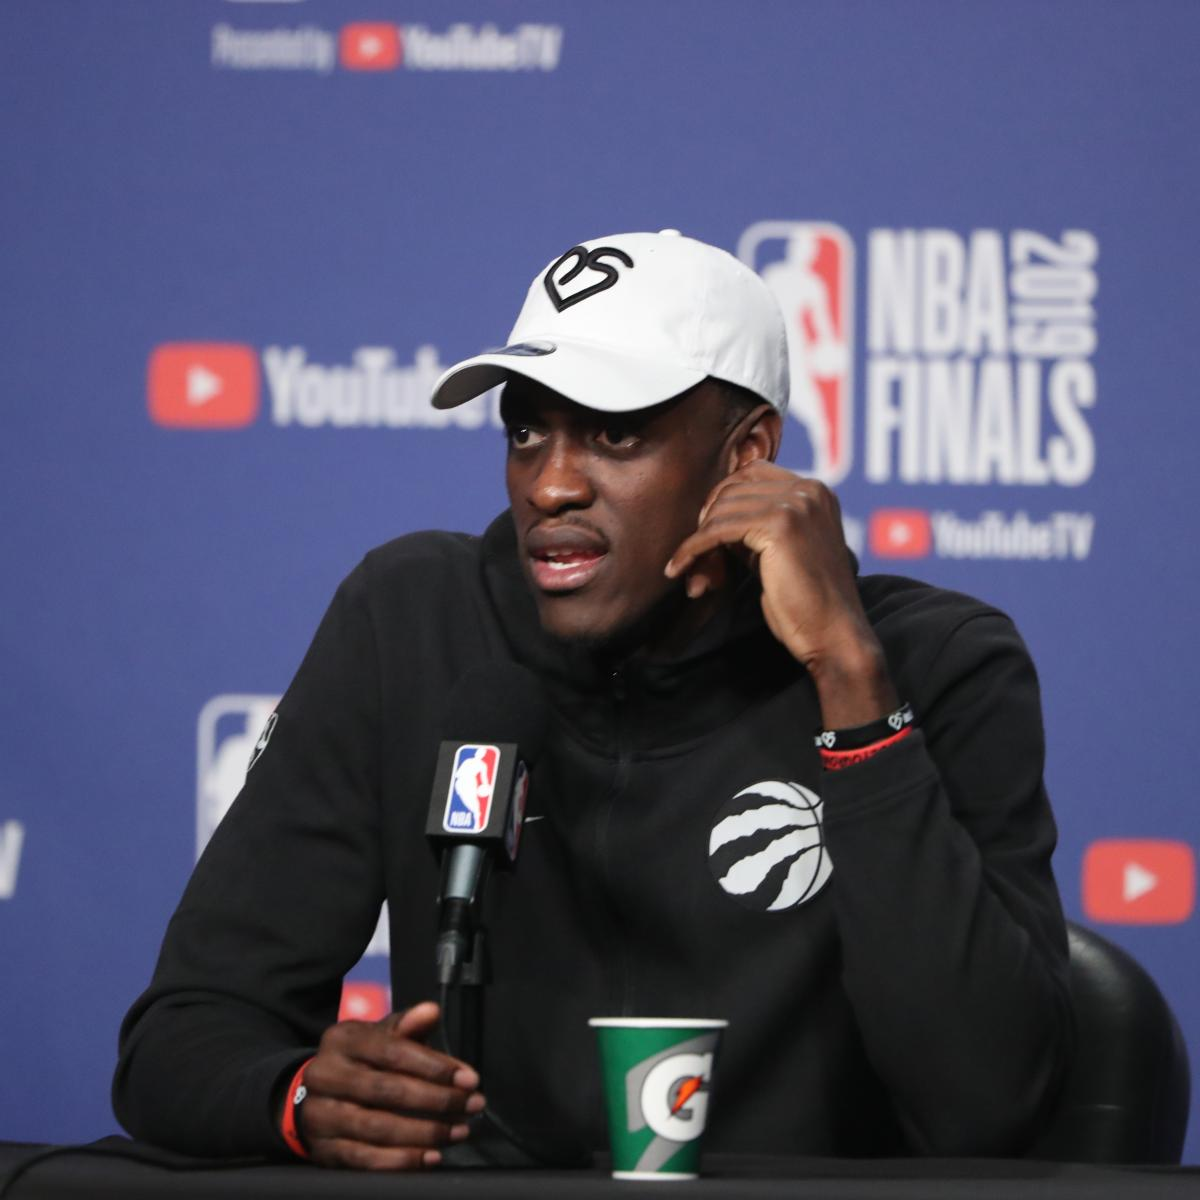 NBA Finals 2019 MVP Odds: Raptors' Pascal Siakam